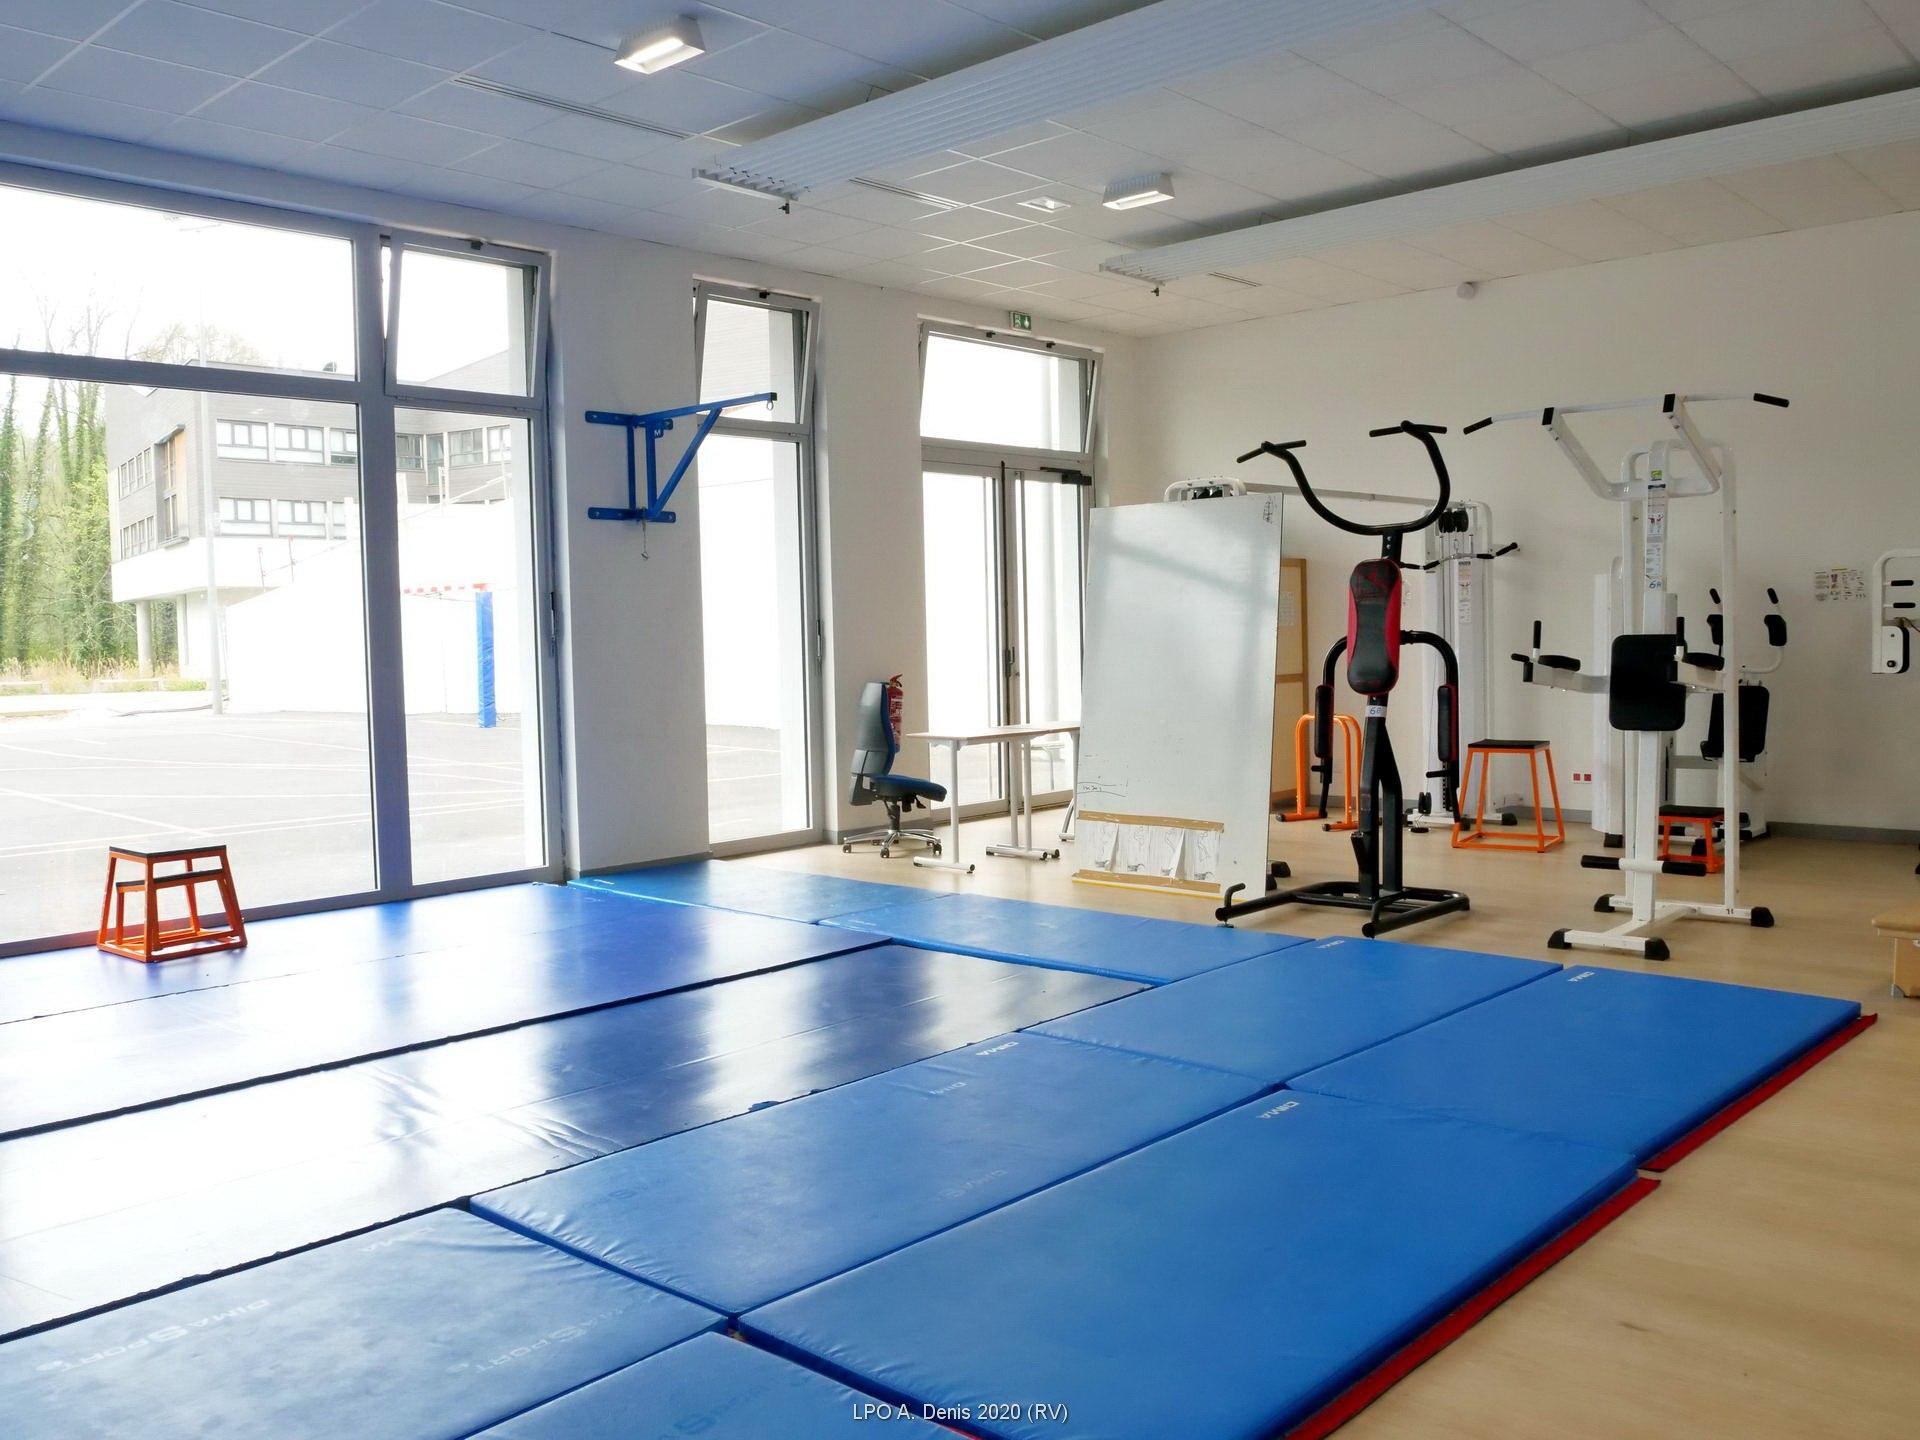 Salle accueillant la musculation